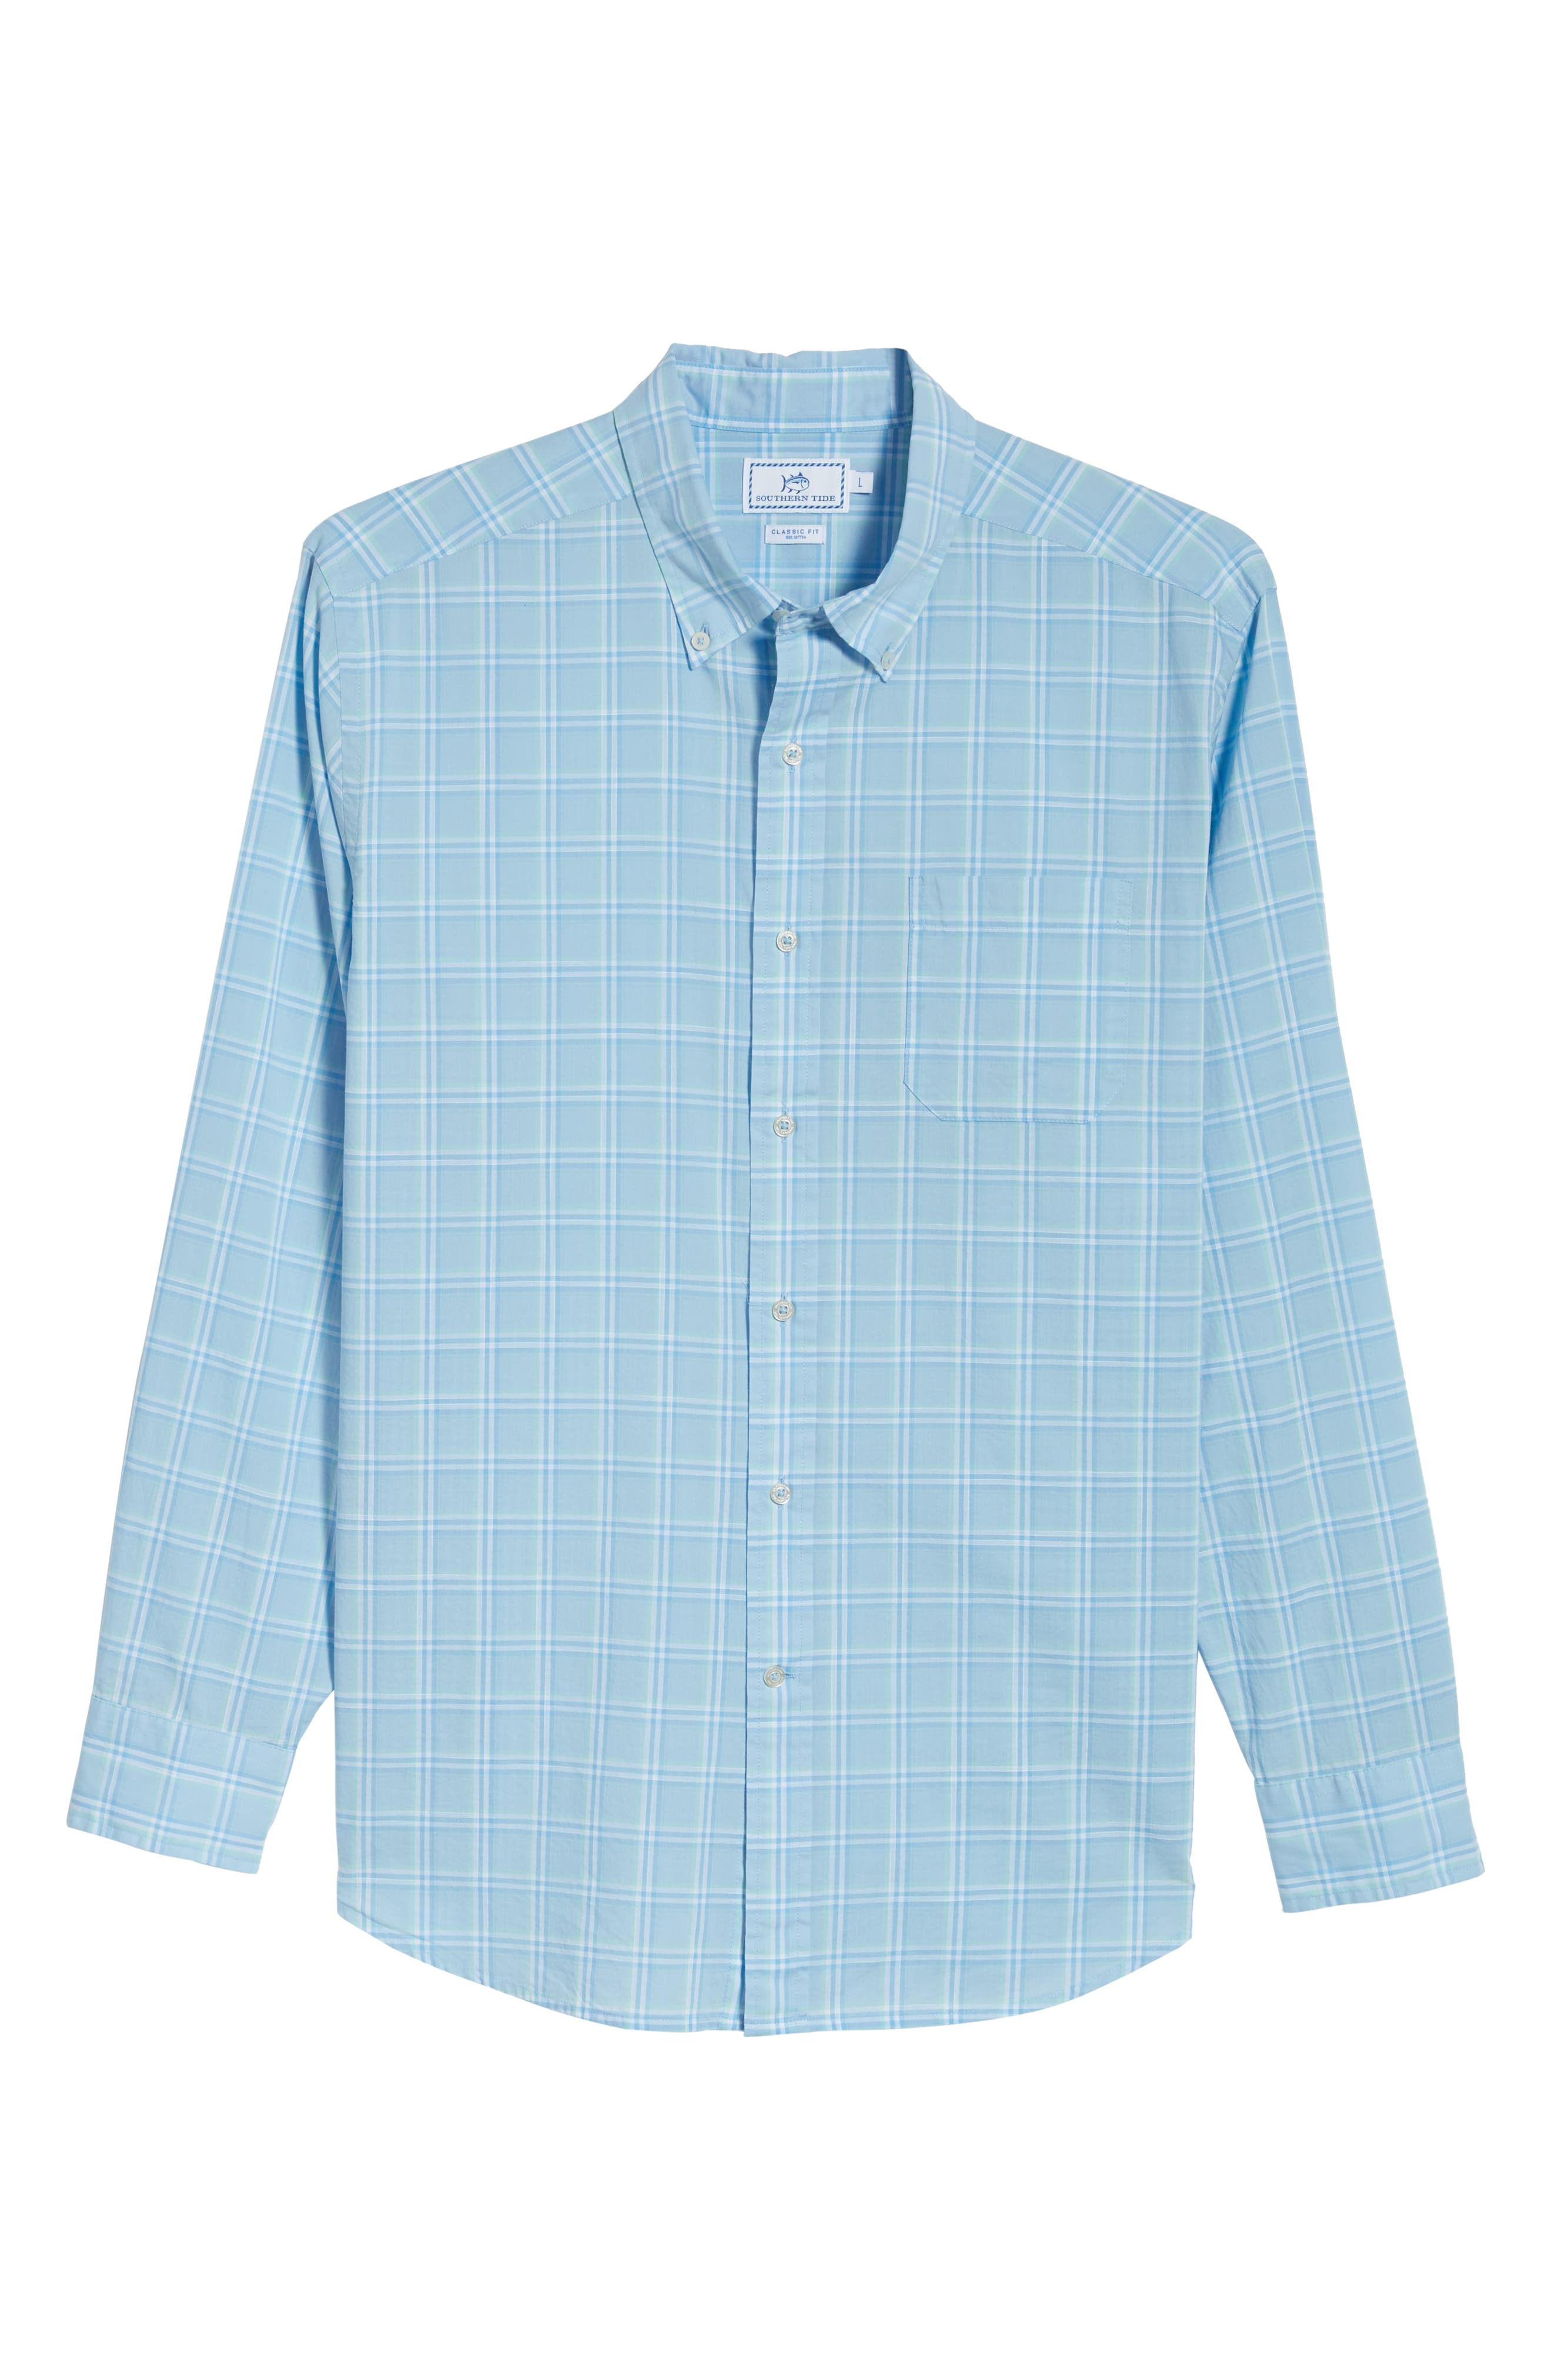 Roadstead Regular Fit Plaid Sport Shirt,                             Alternate thumbnail 6, color,                             450